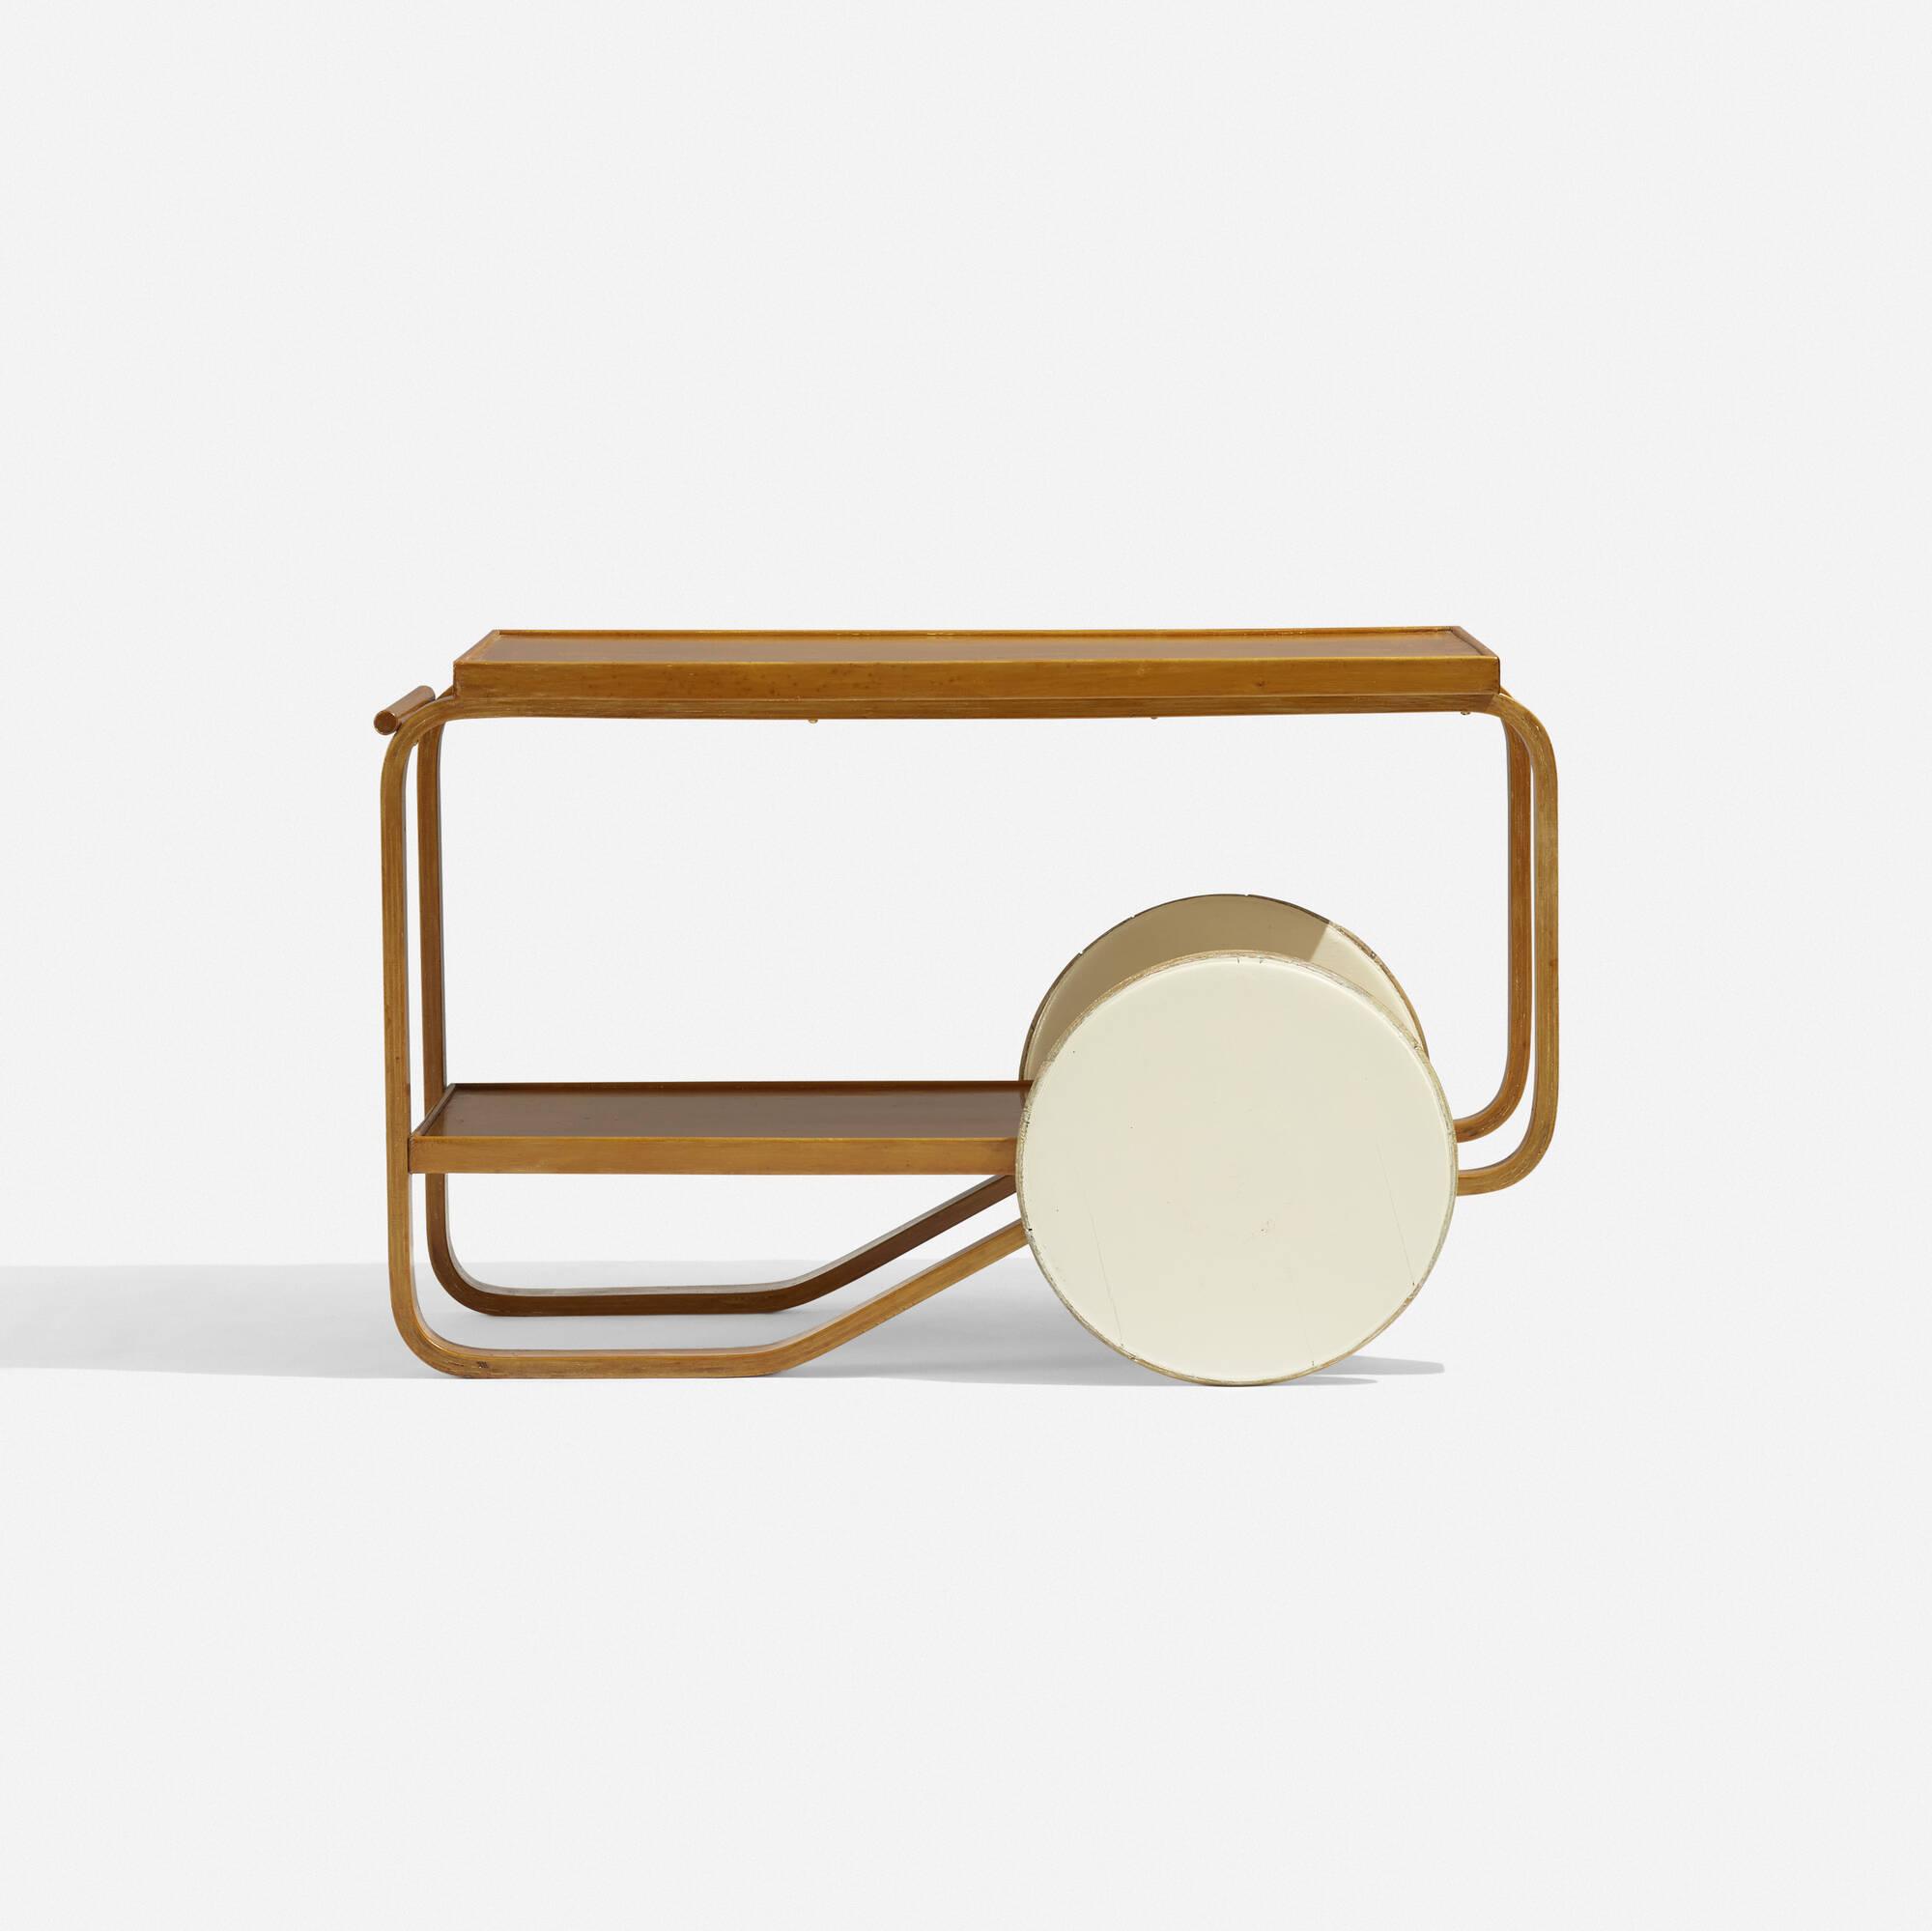 156: Alvar Aalto / tea trolley (1 of 3)